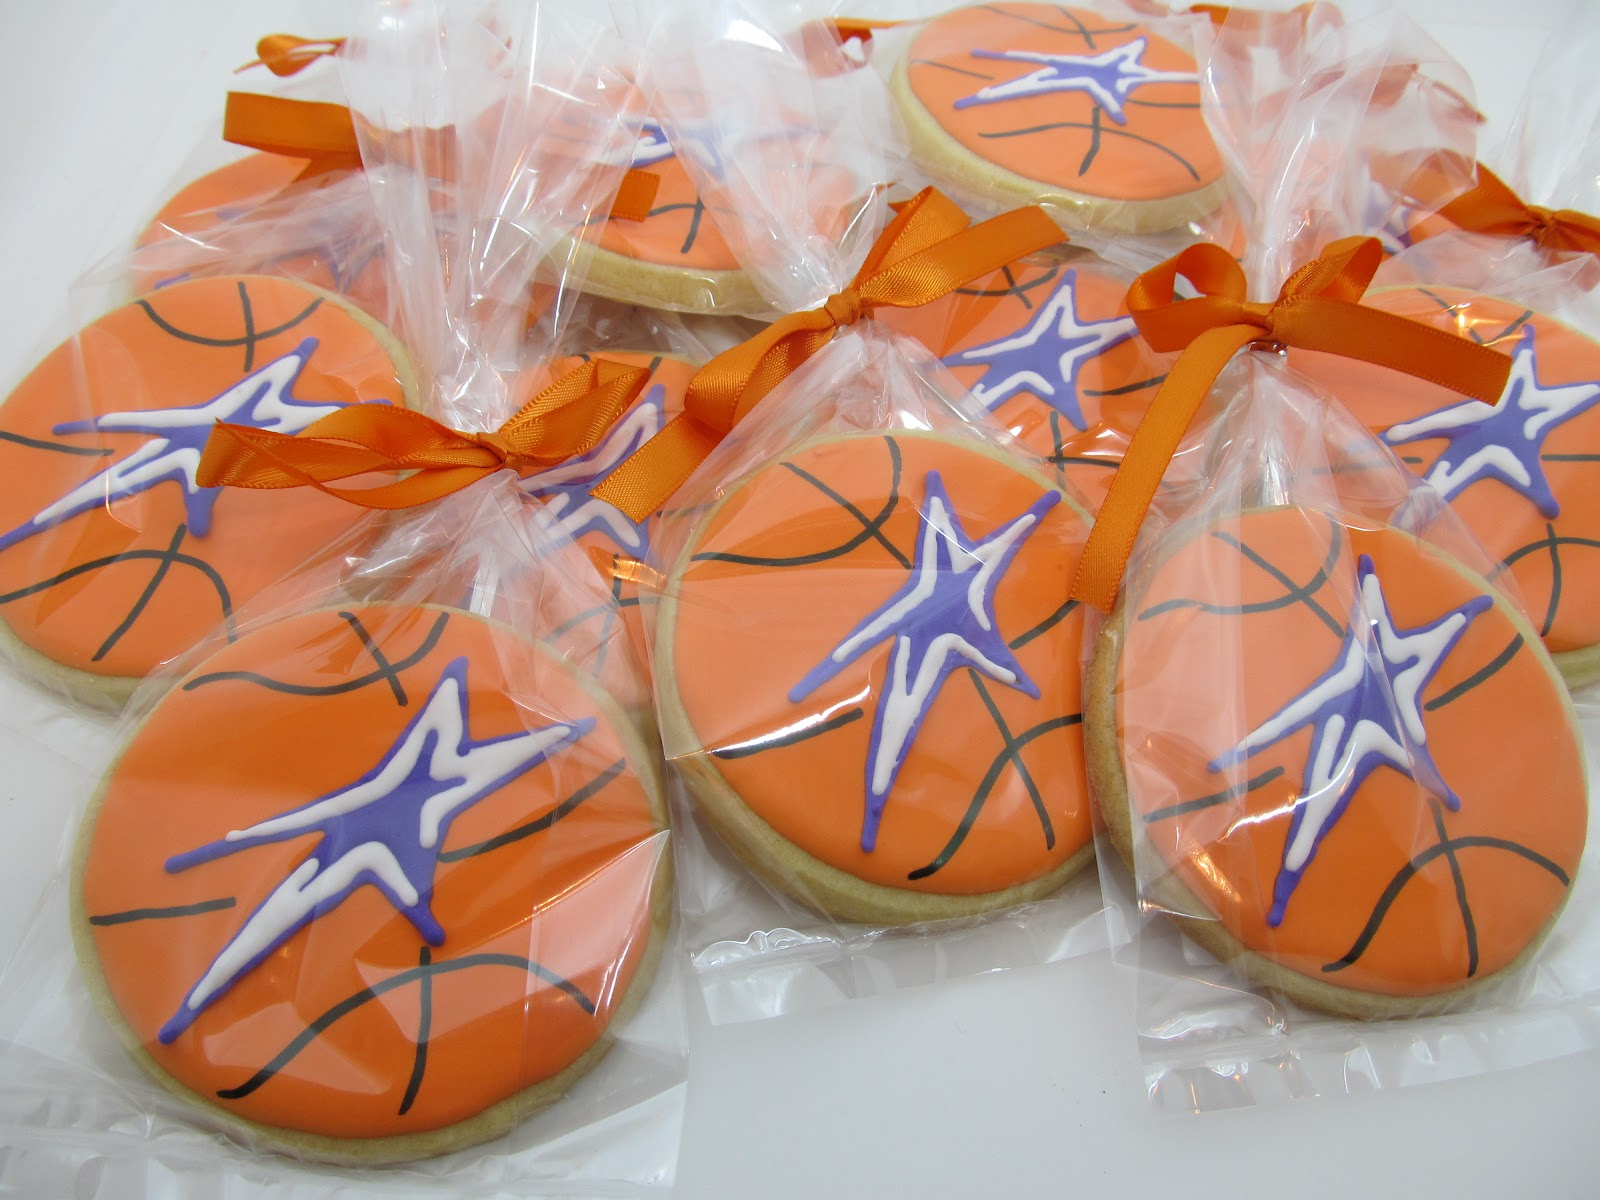 Cookies in the Cupboard Upward Basketball